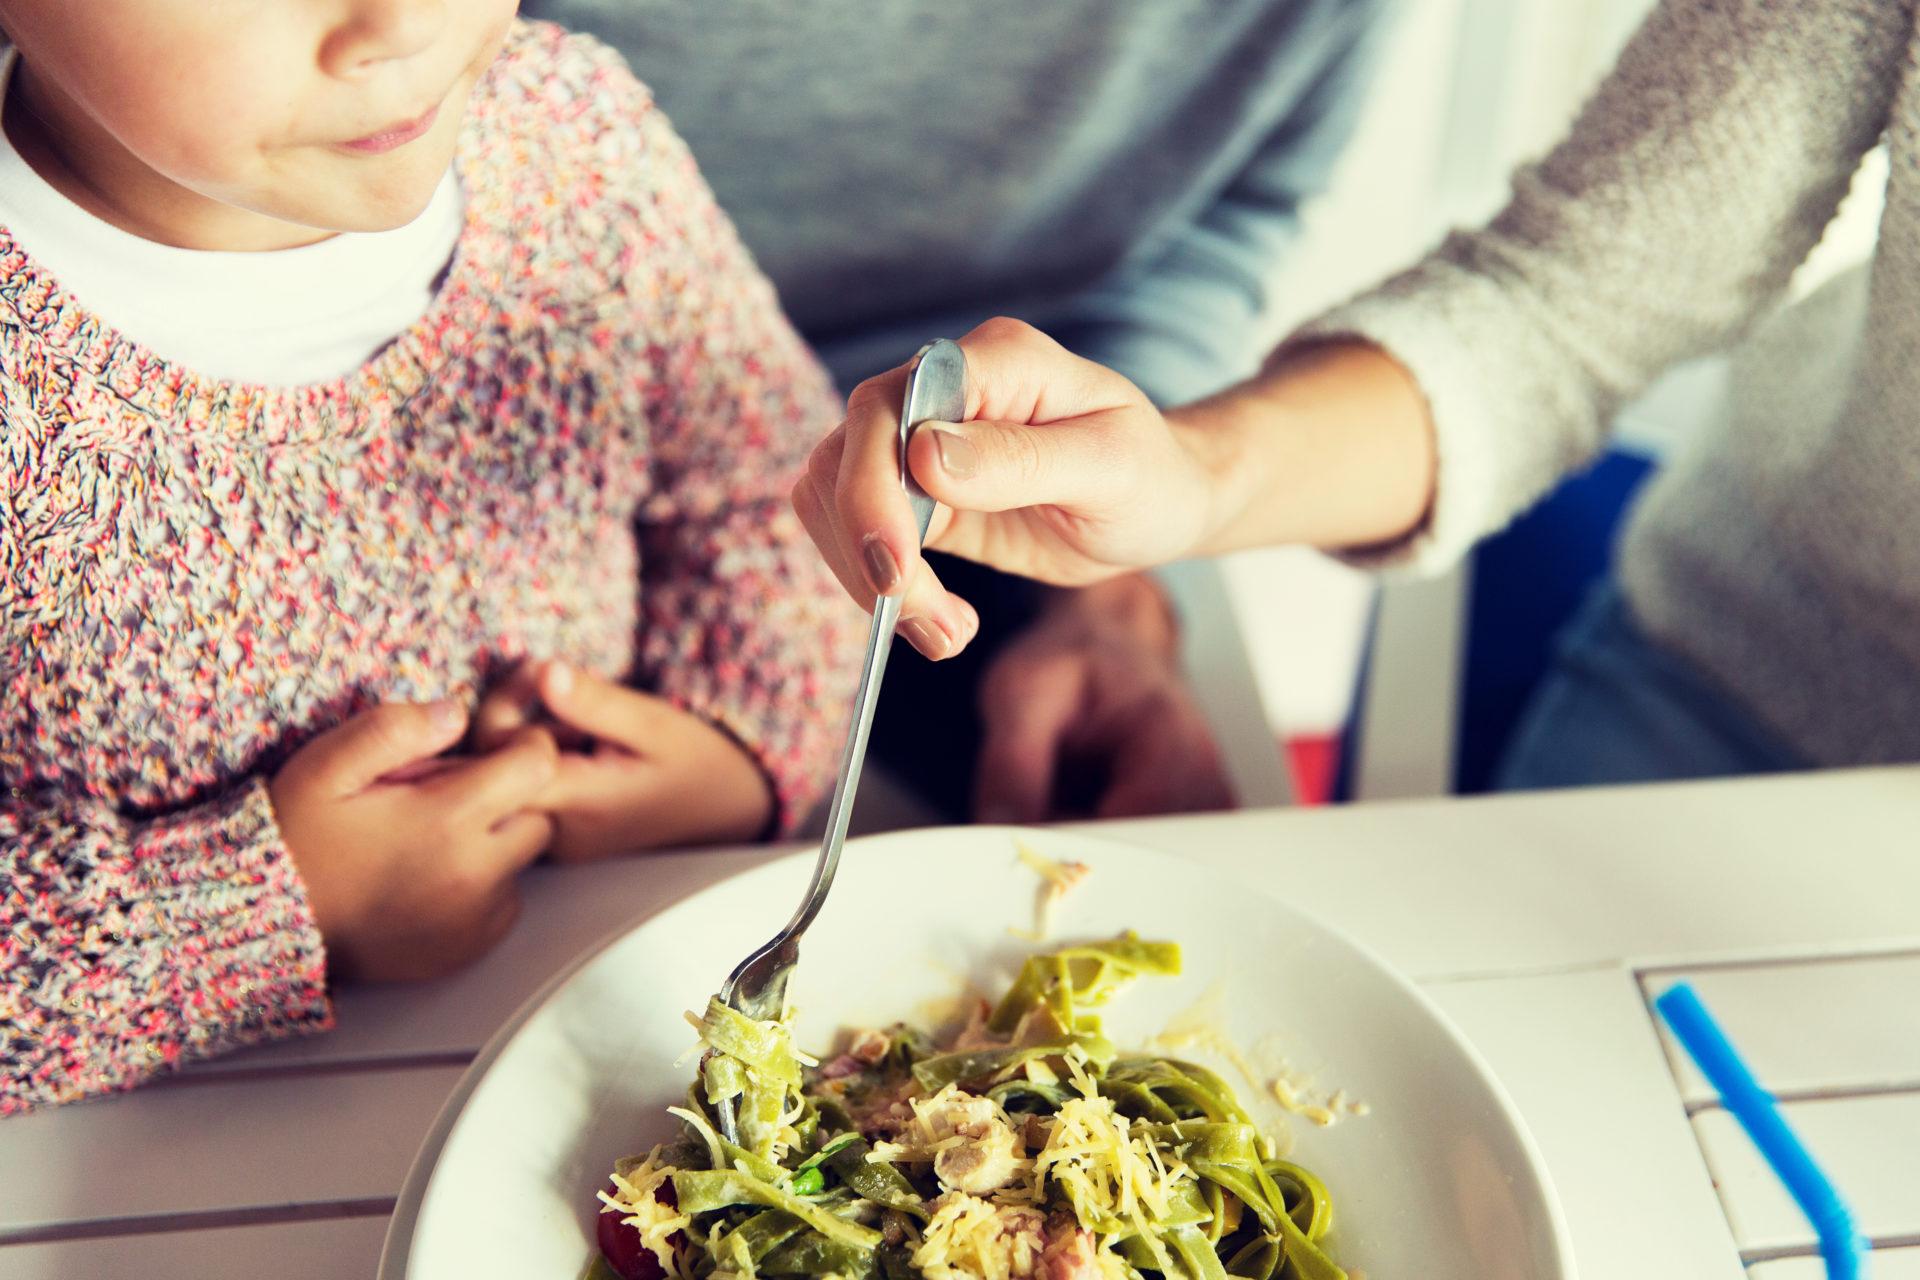 Familienfreundliches Café – Merz Chur